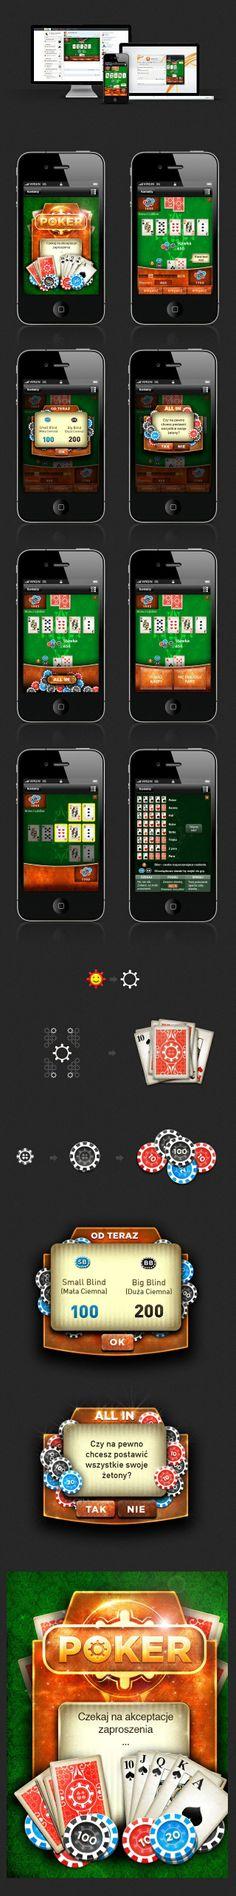 double win slots casino games